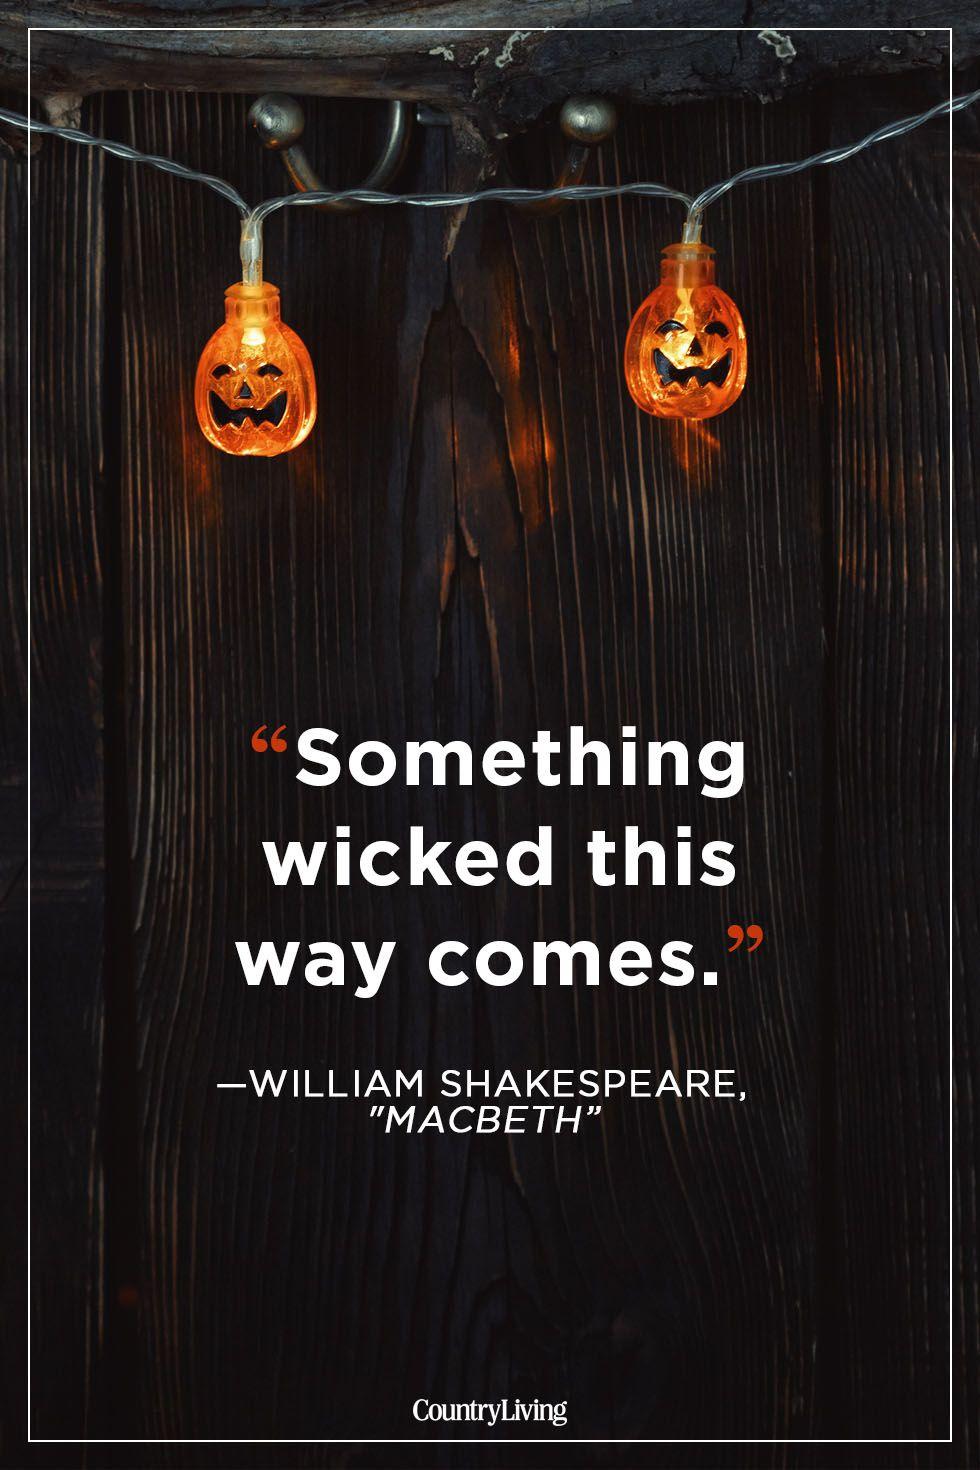 halloween quotes william shakespeare macbeth